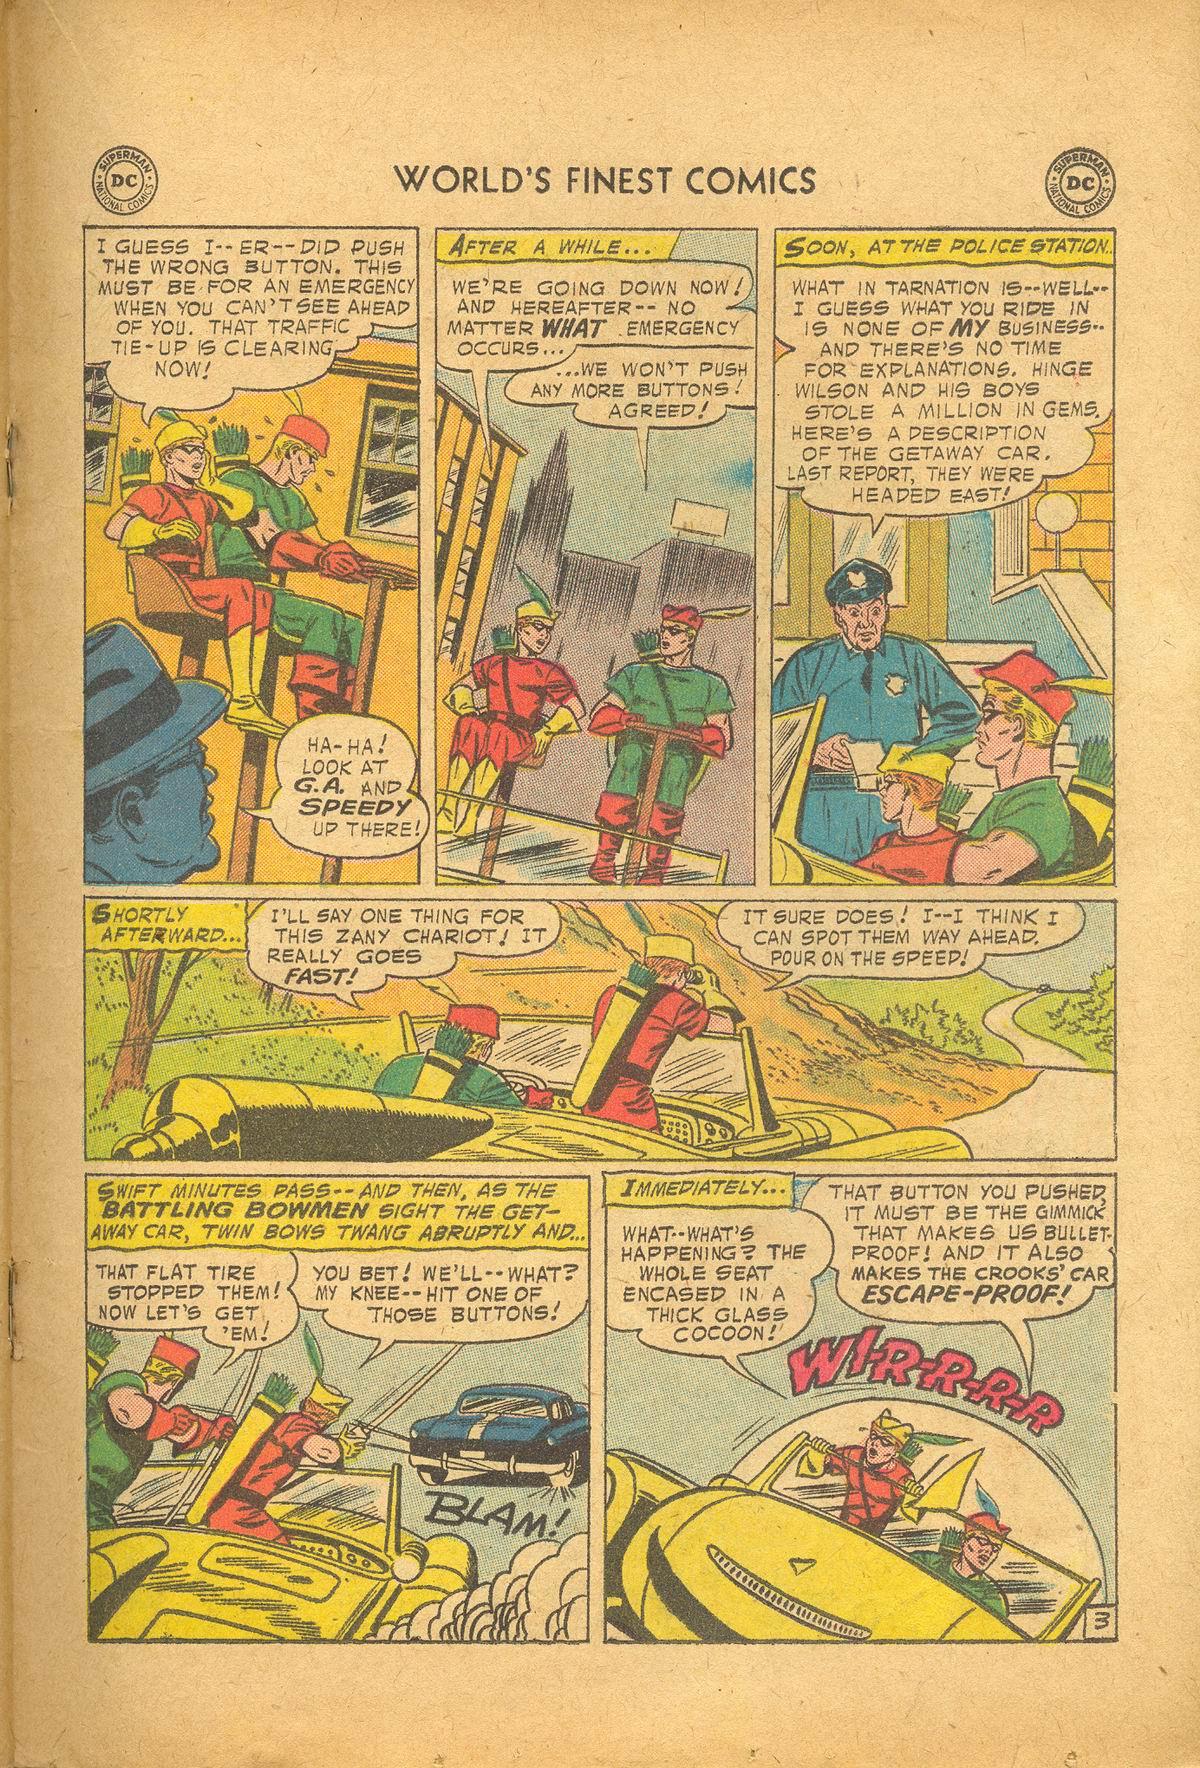 Read online World's Finest Comics comic -  Issue #83 - 19